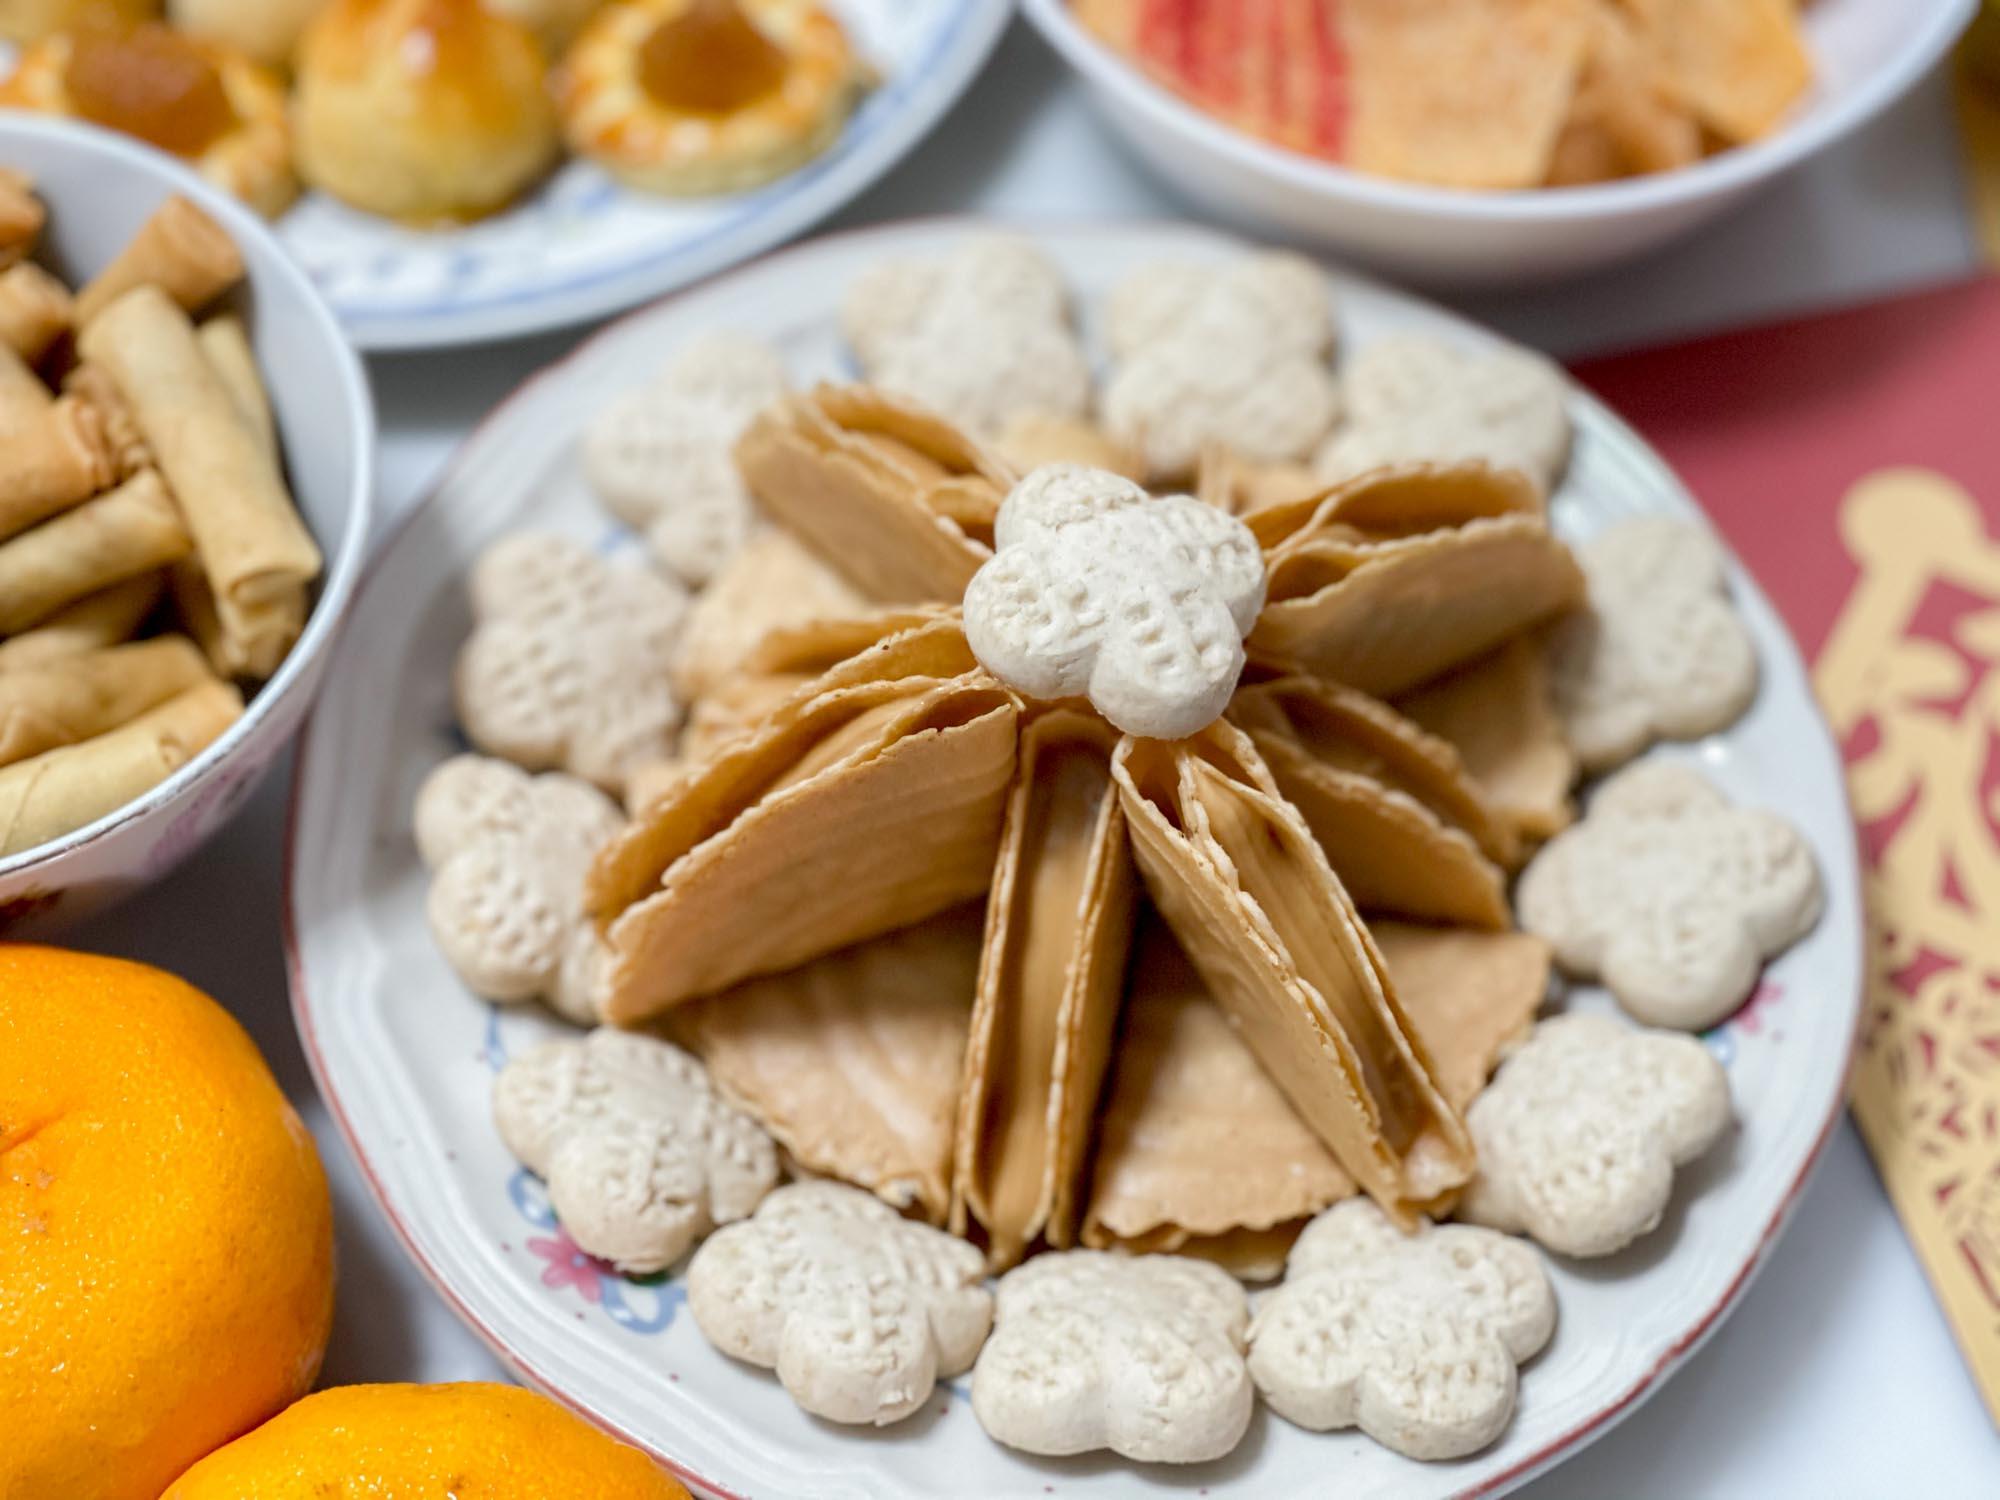 Pineapple-tarts-cny2021-darrenbloggie